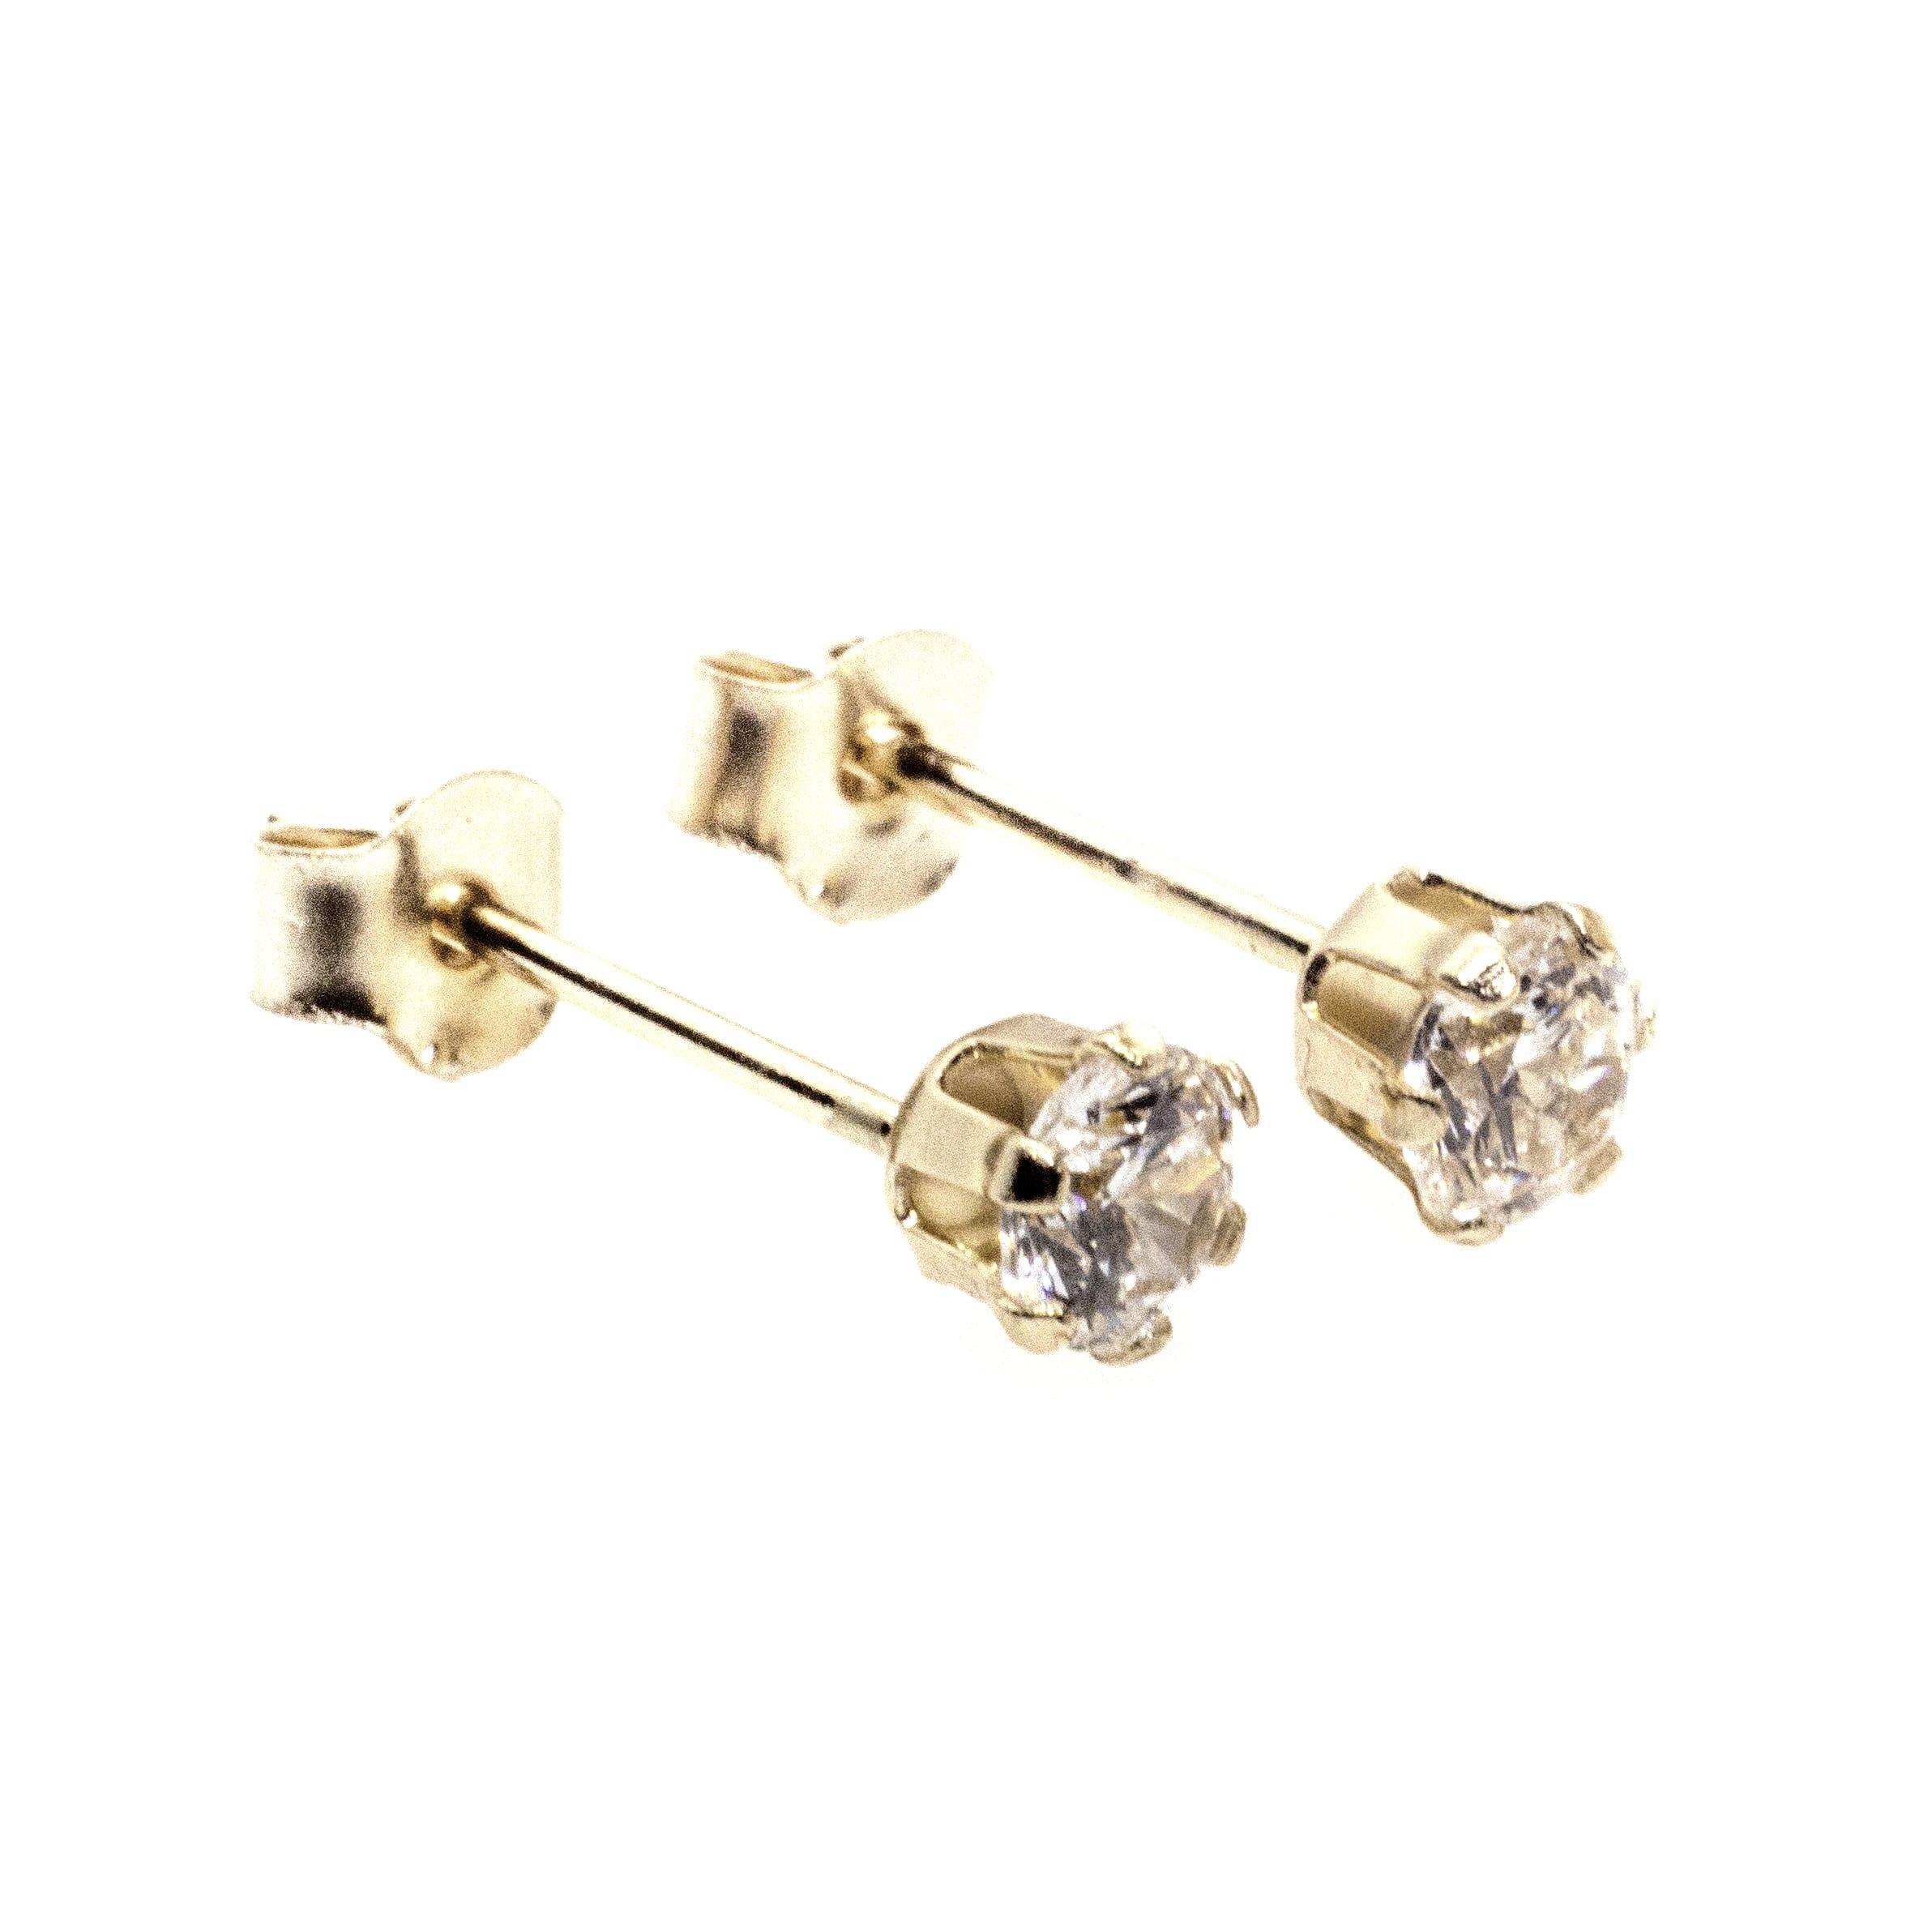 4mm CZ stud earrings 9ct yellow gold alt 2